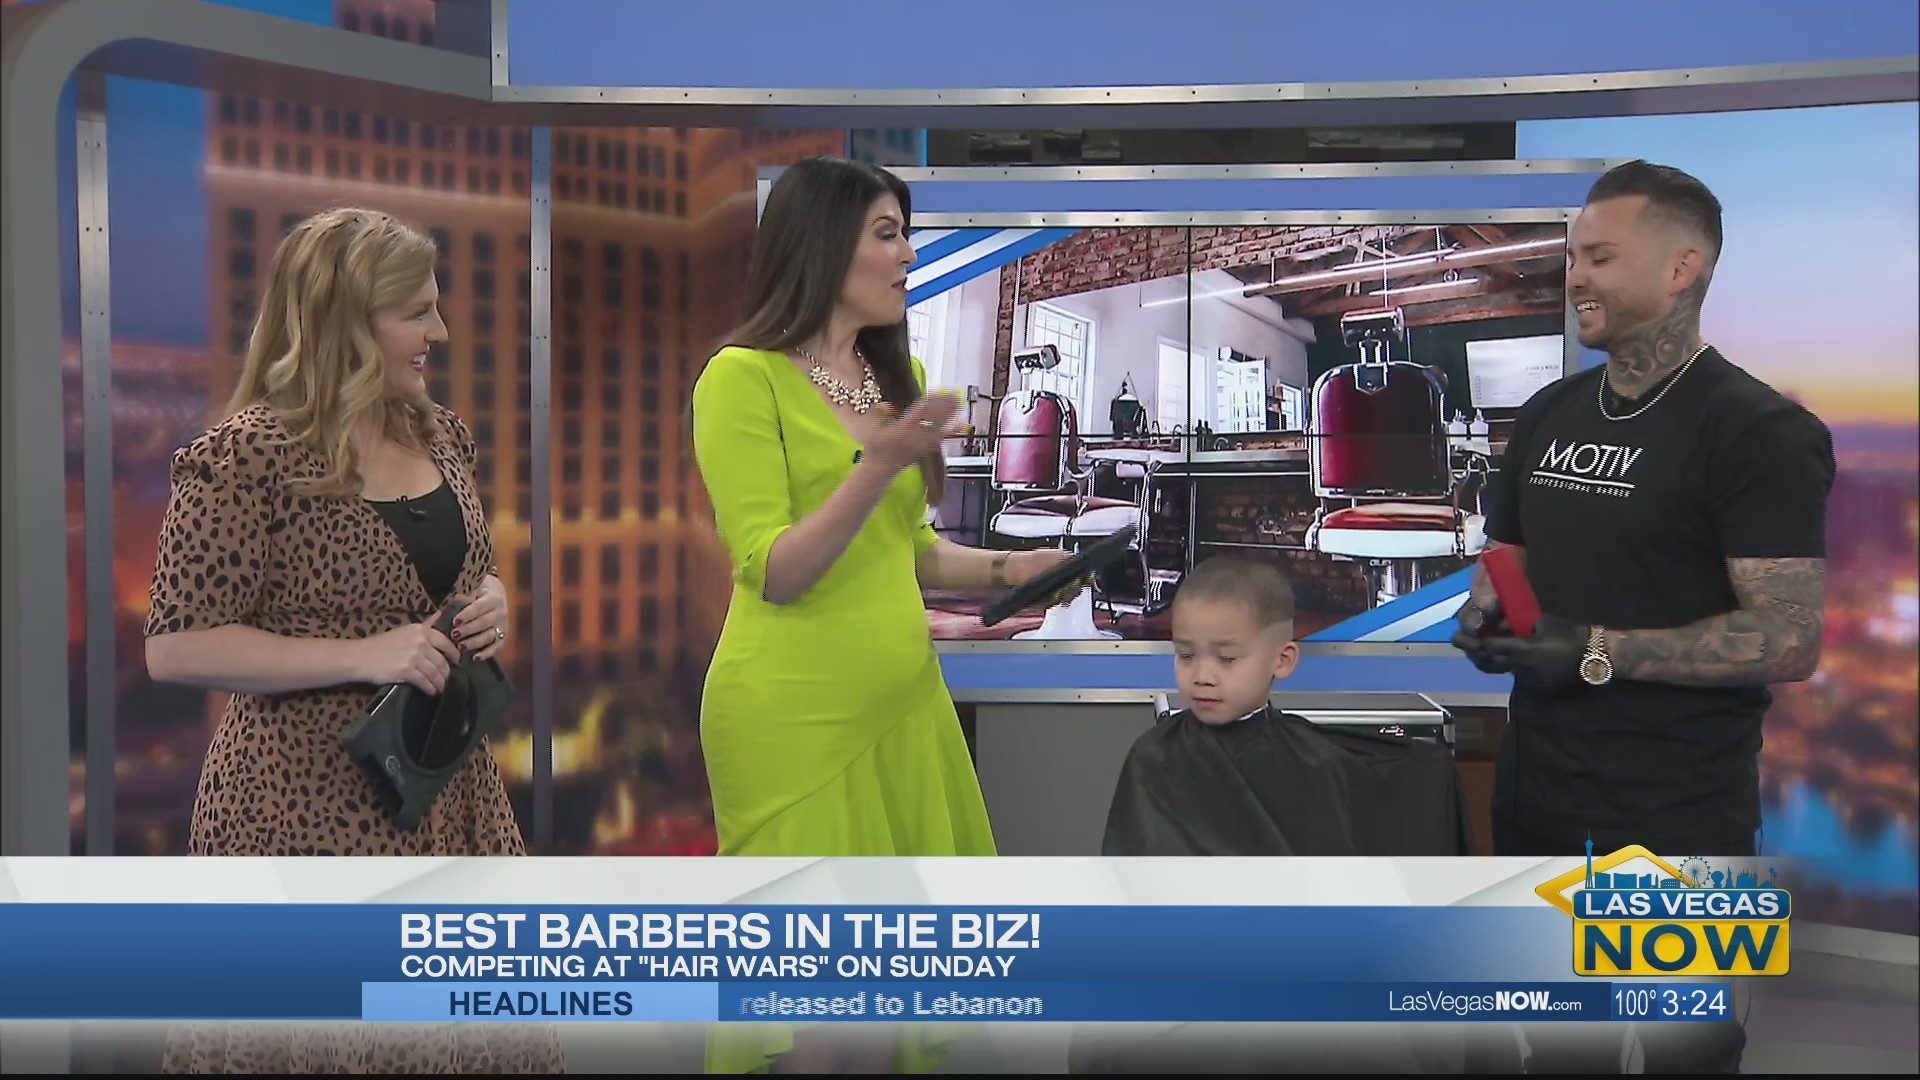 The best barbers in the biz head to Vegas